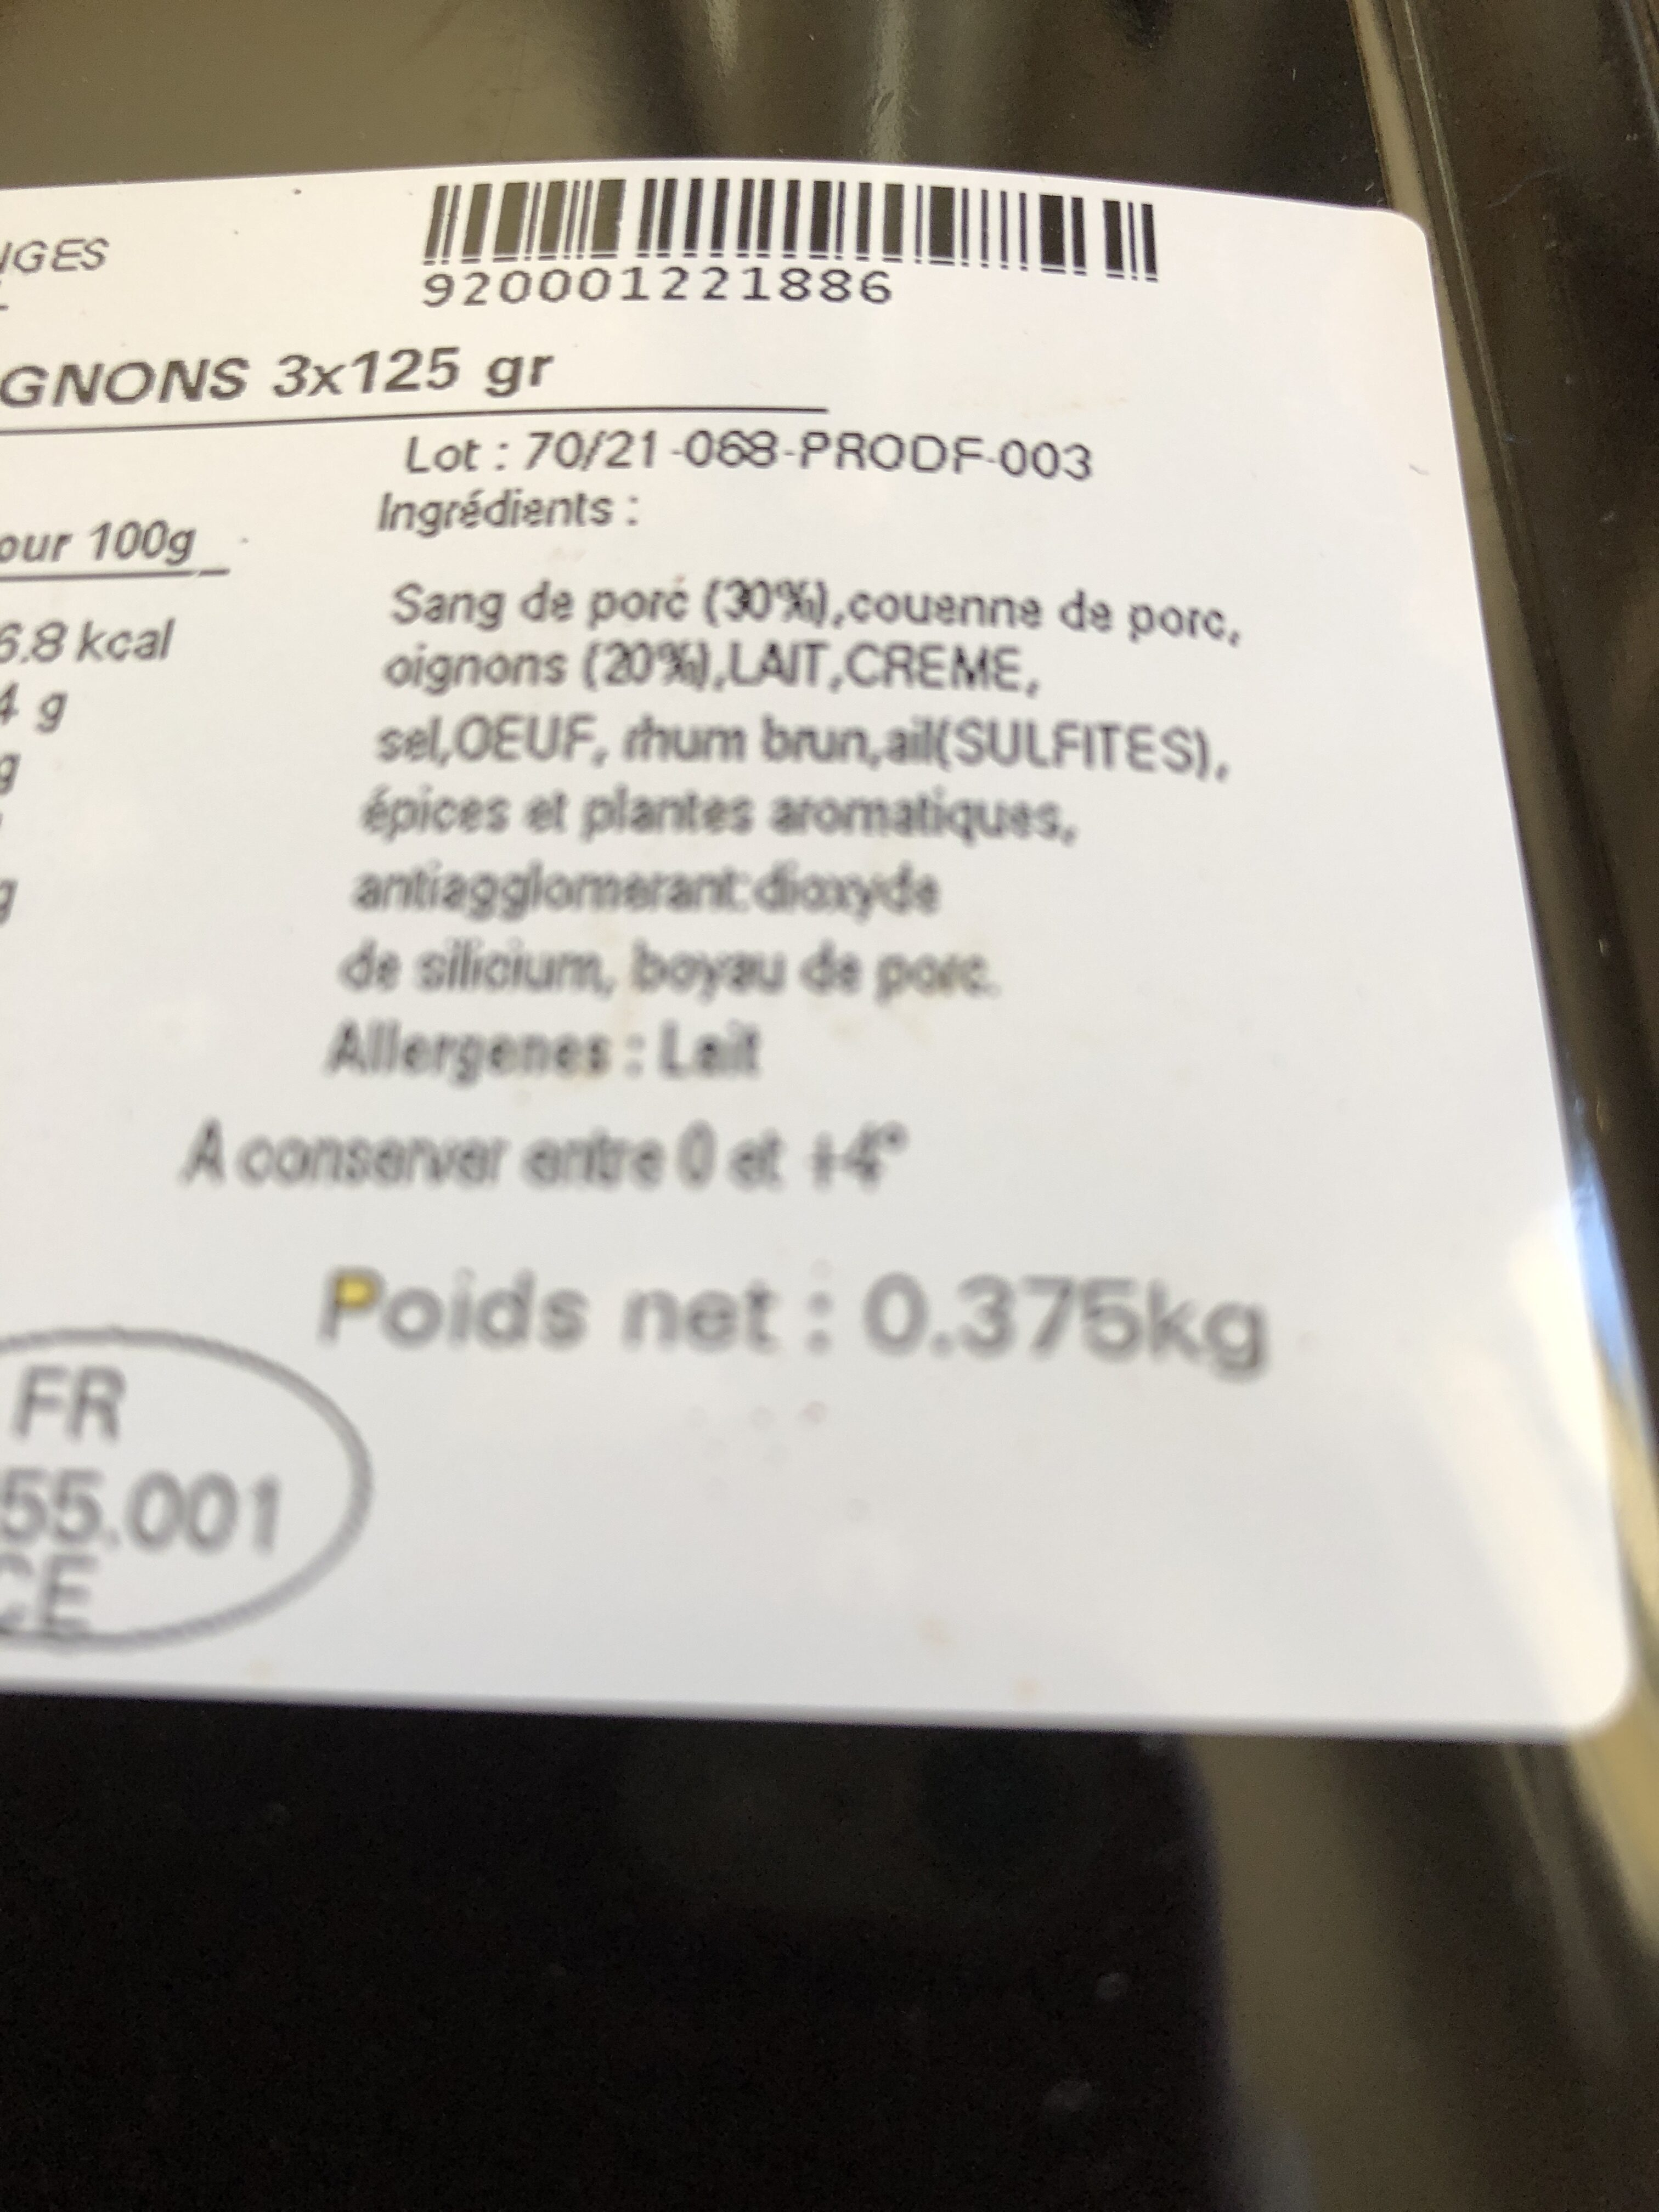 Boudin aux oignons - Ingredients - fr